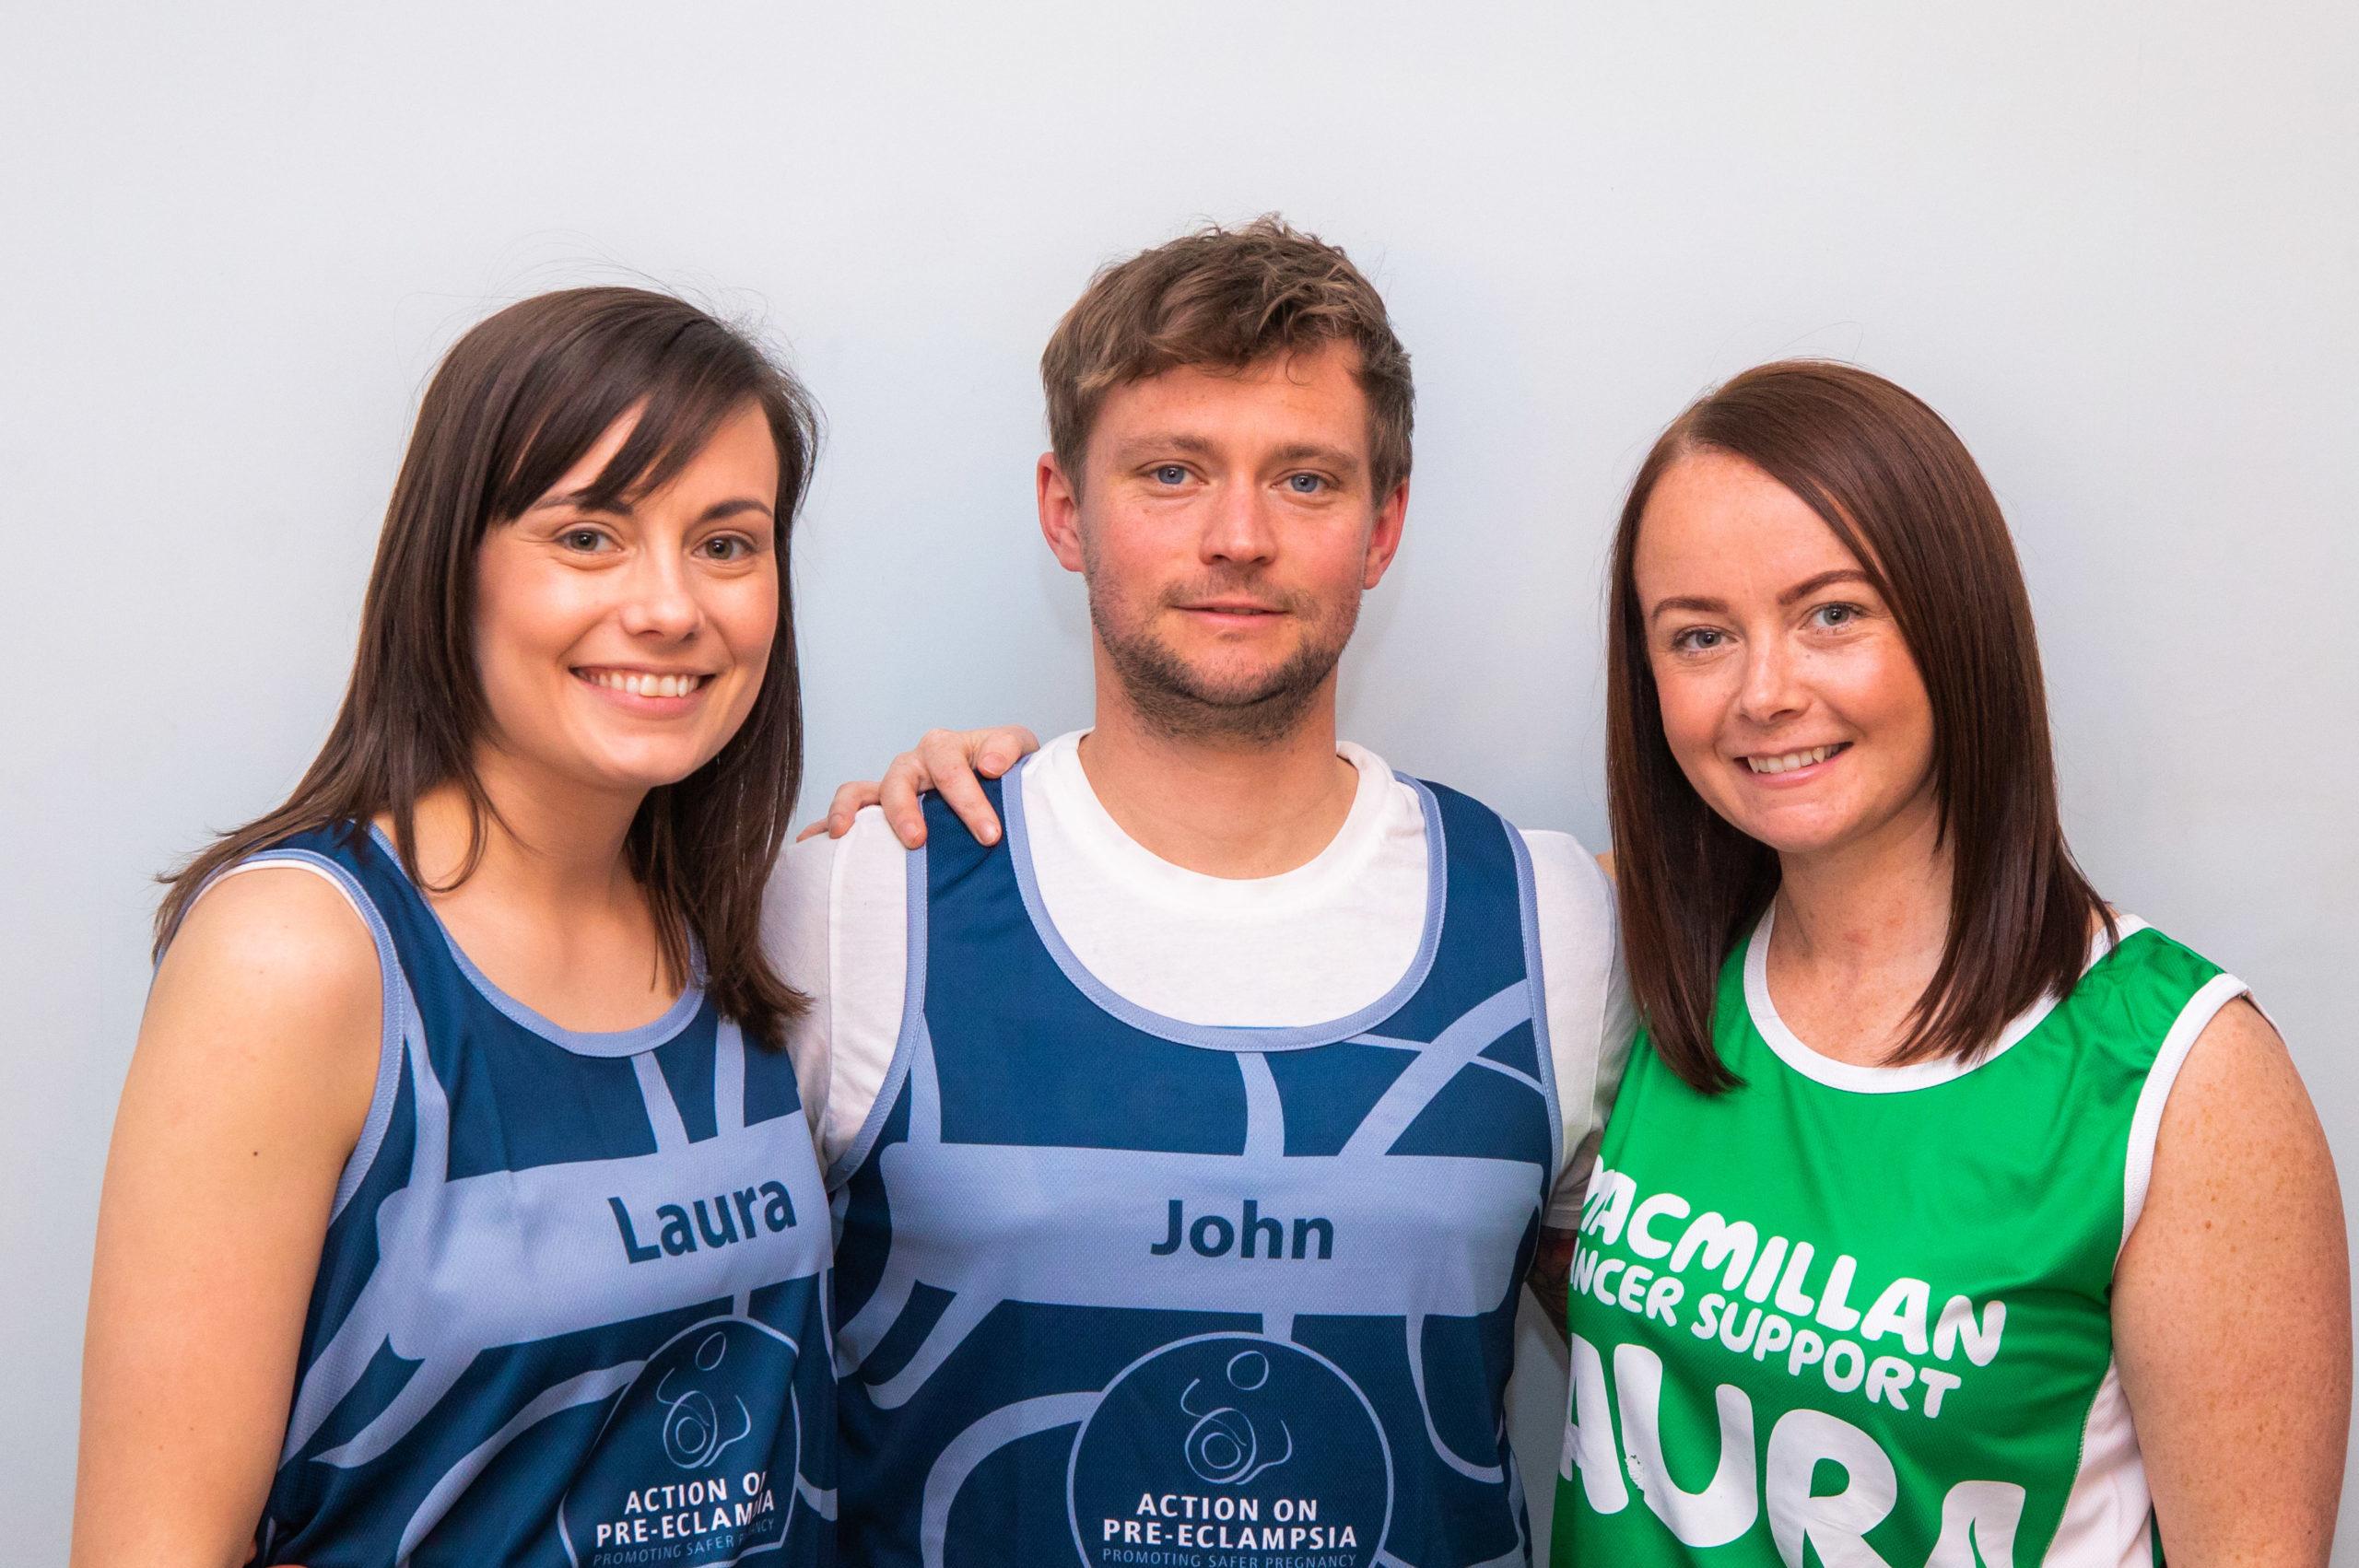 Laura and John Penman are running the London Marathon in April with John's sister Laura MacKenzie.